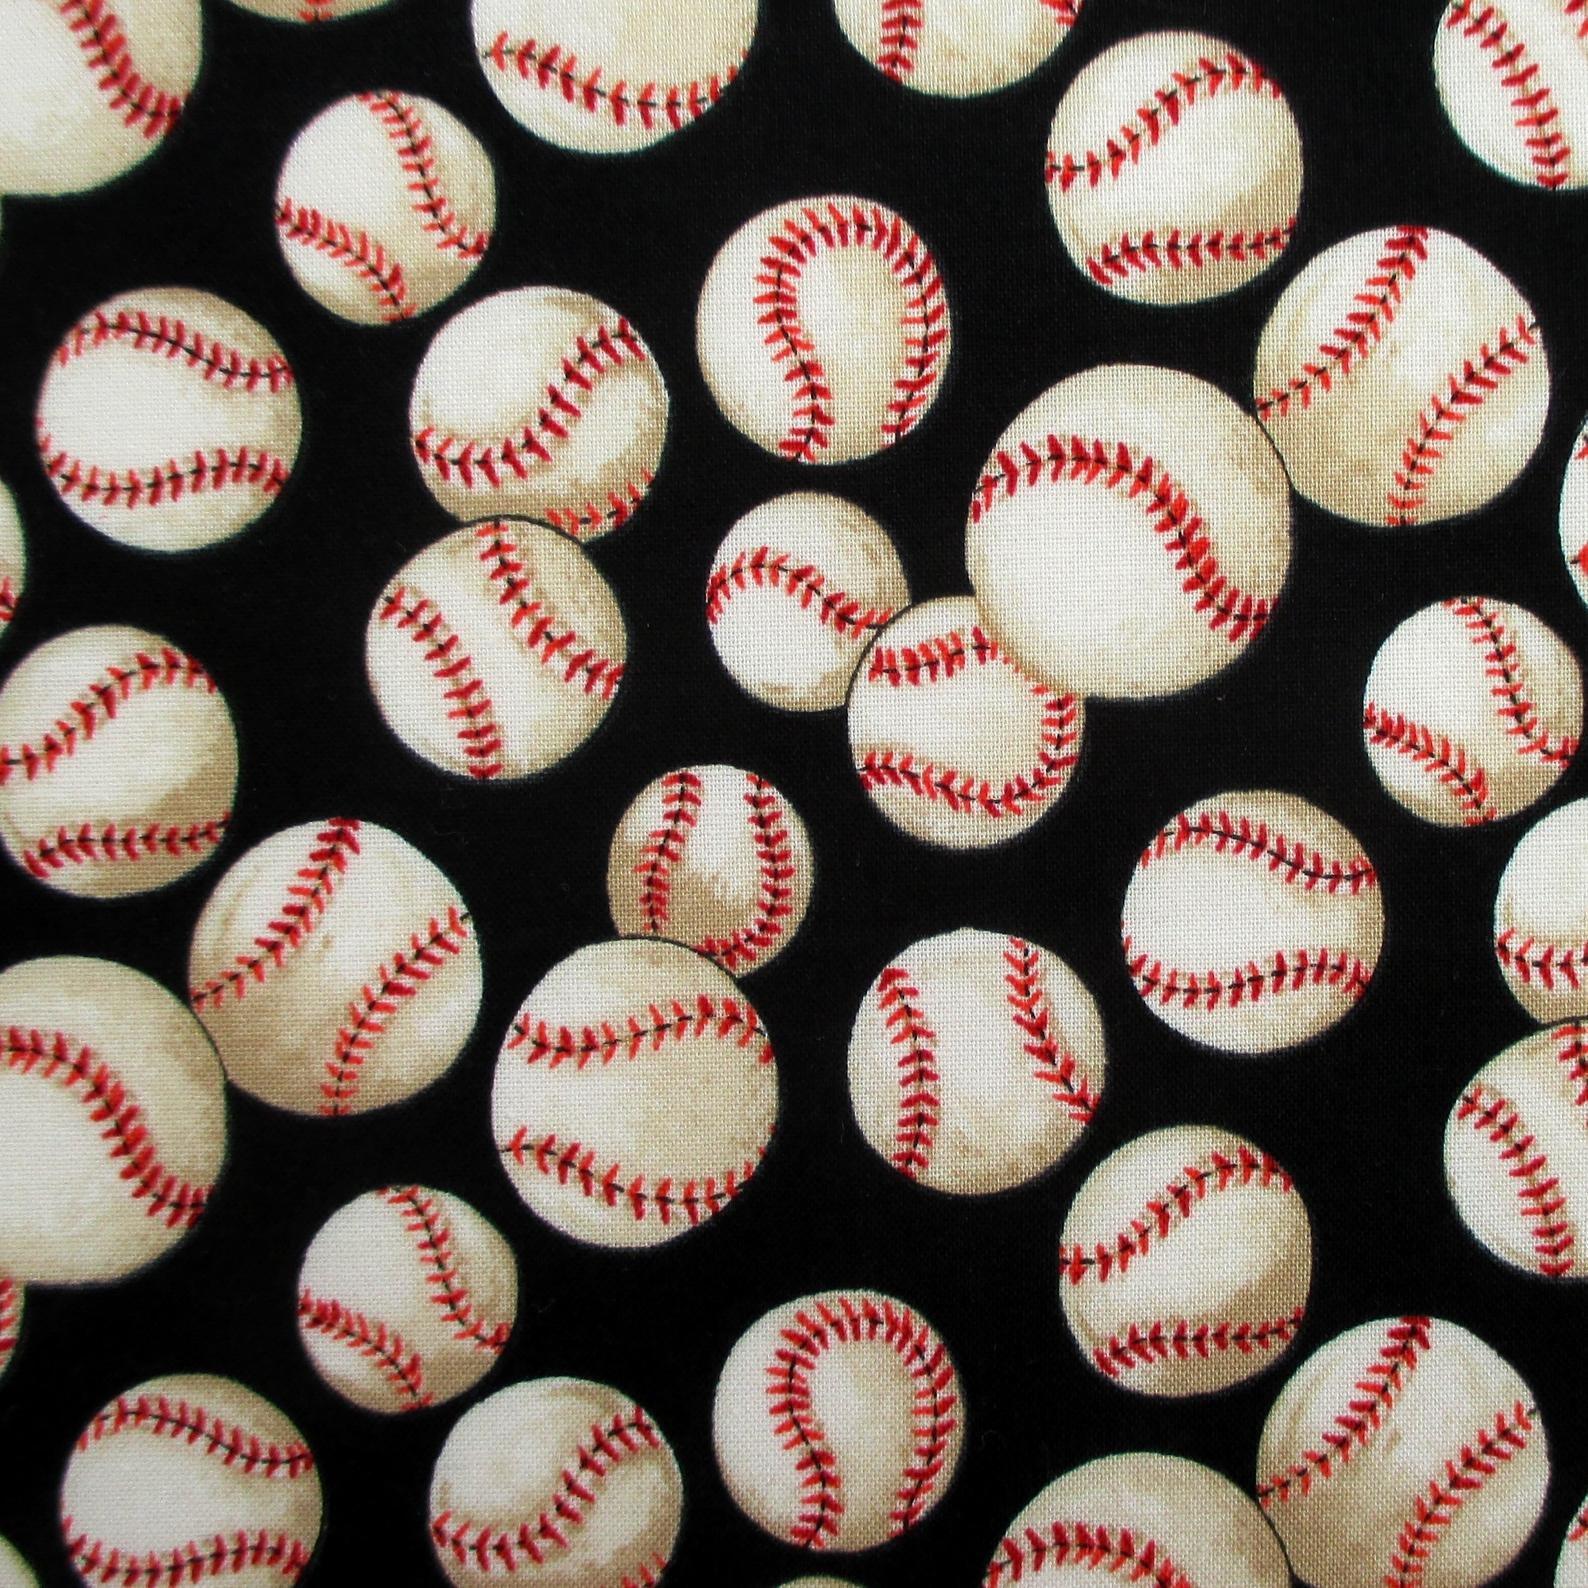 Baseballs on Black #6014F